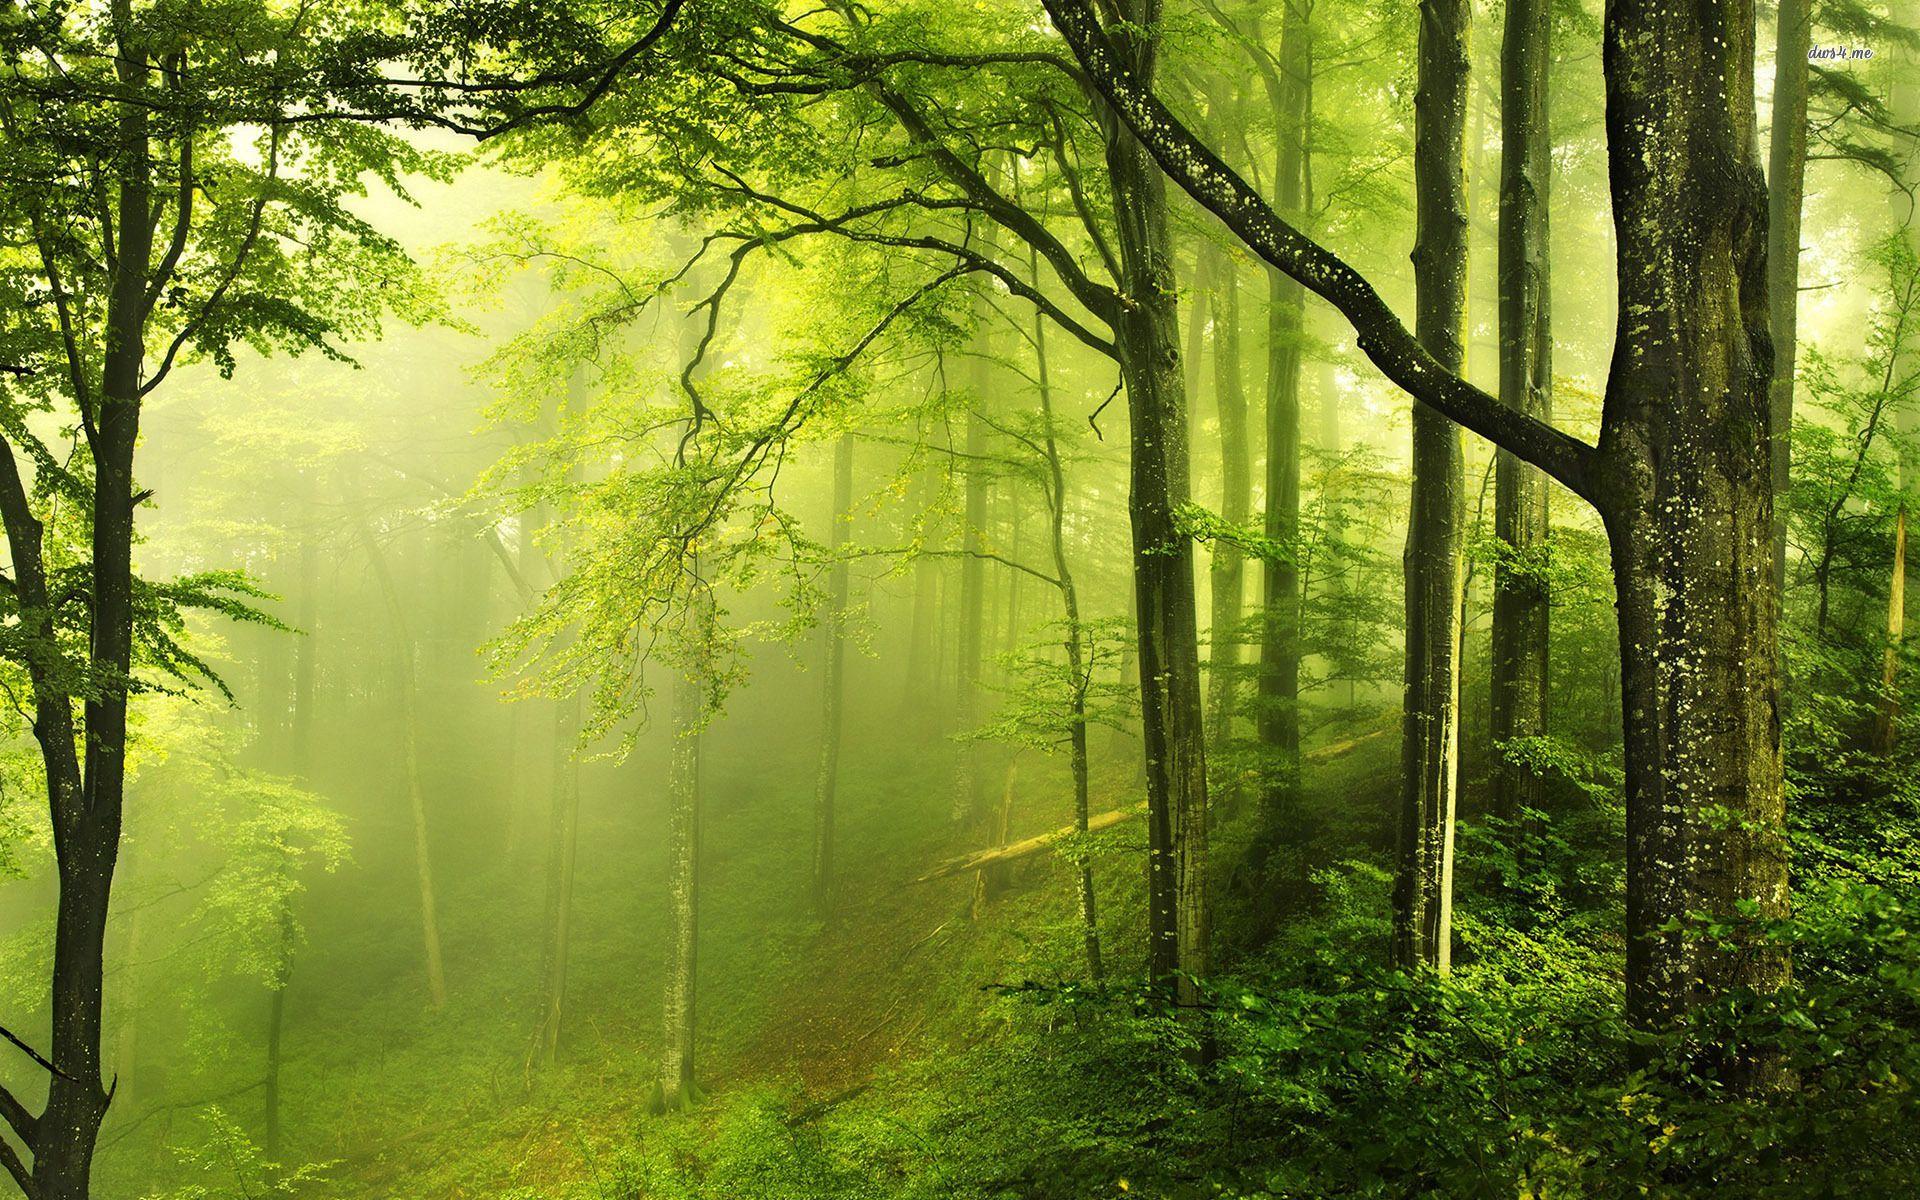 Beautiful Green Forest Hd Desktop Wallpaper Instagram Photo Background Image Forest Wallpaper Beautiful Forest Landscape Trees